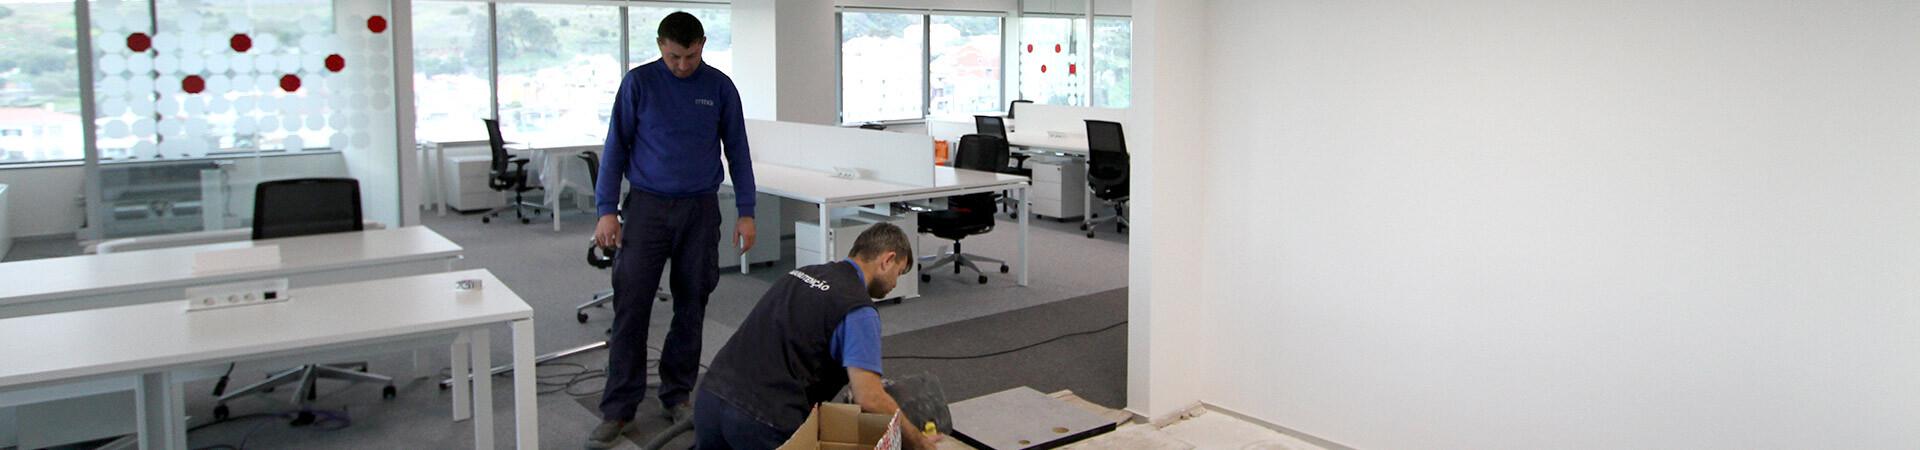 Fit-out, Refurbishment & Project Management . TDGI Portugal